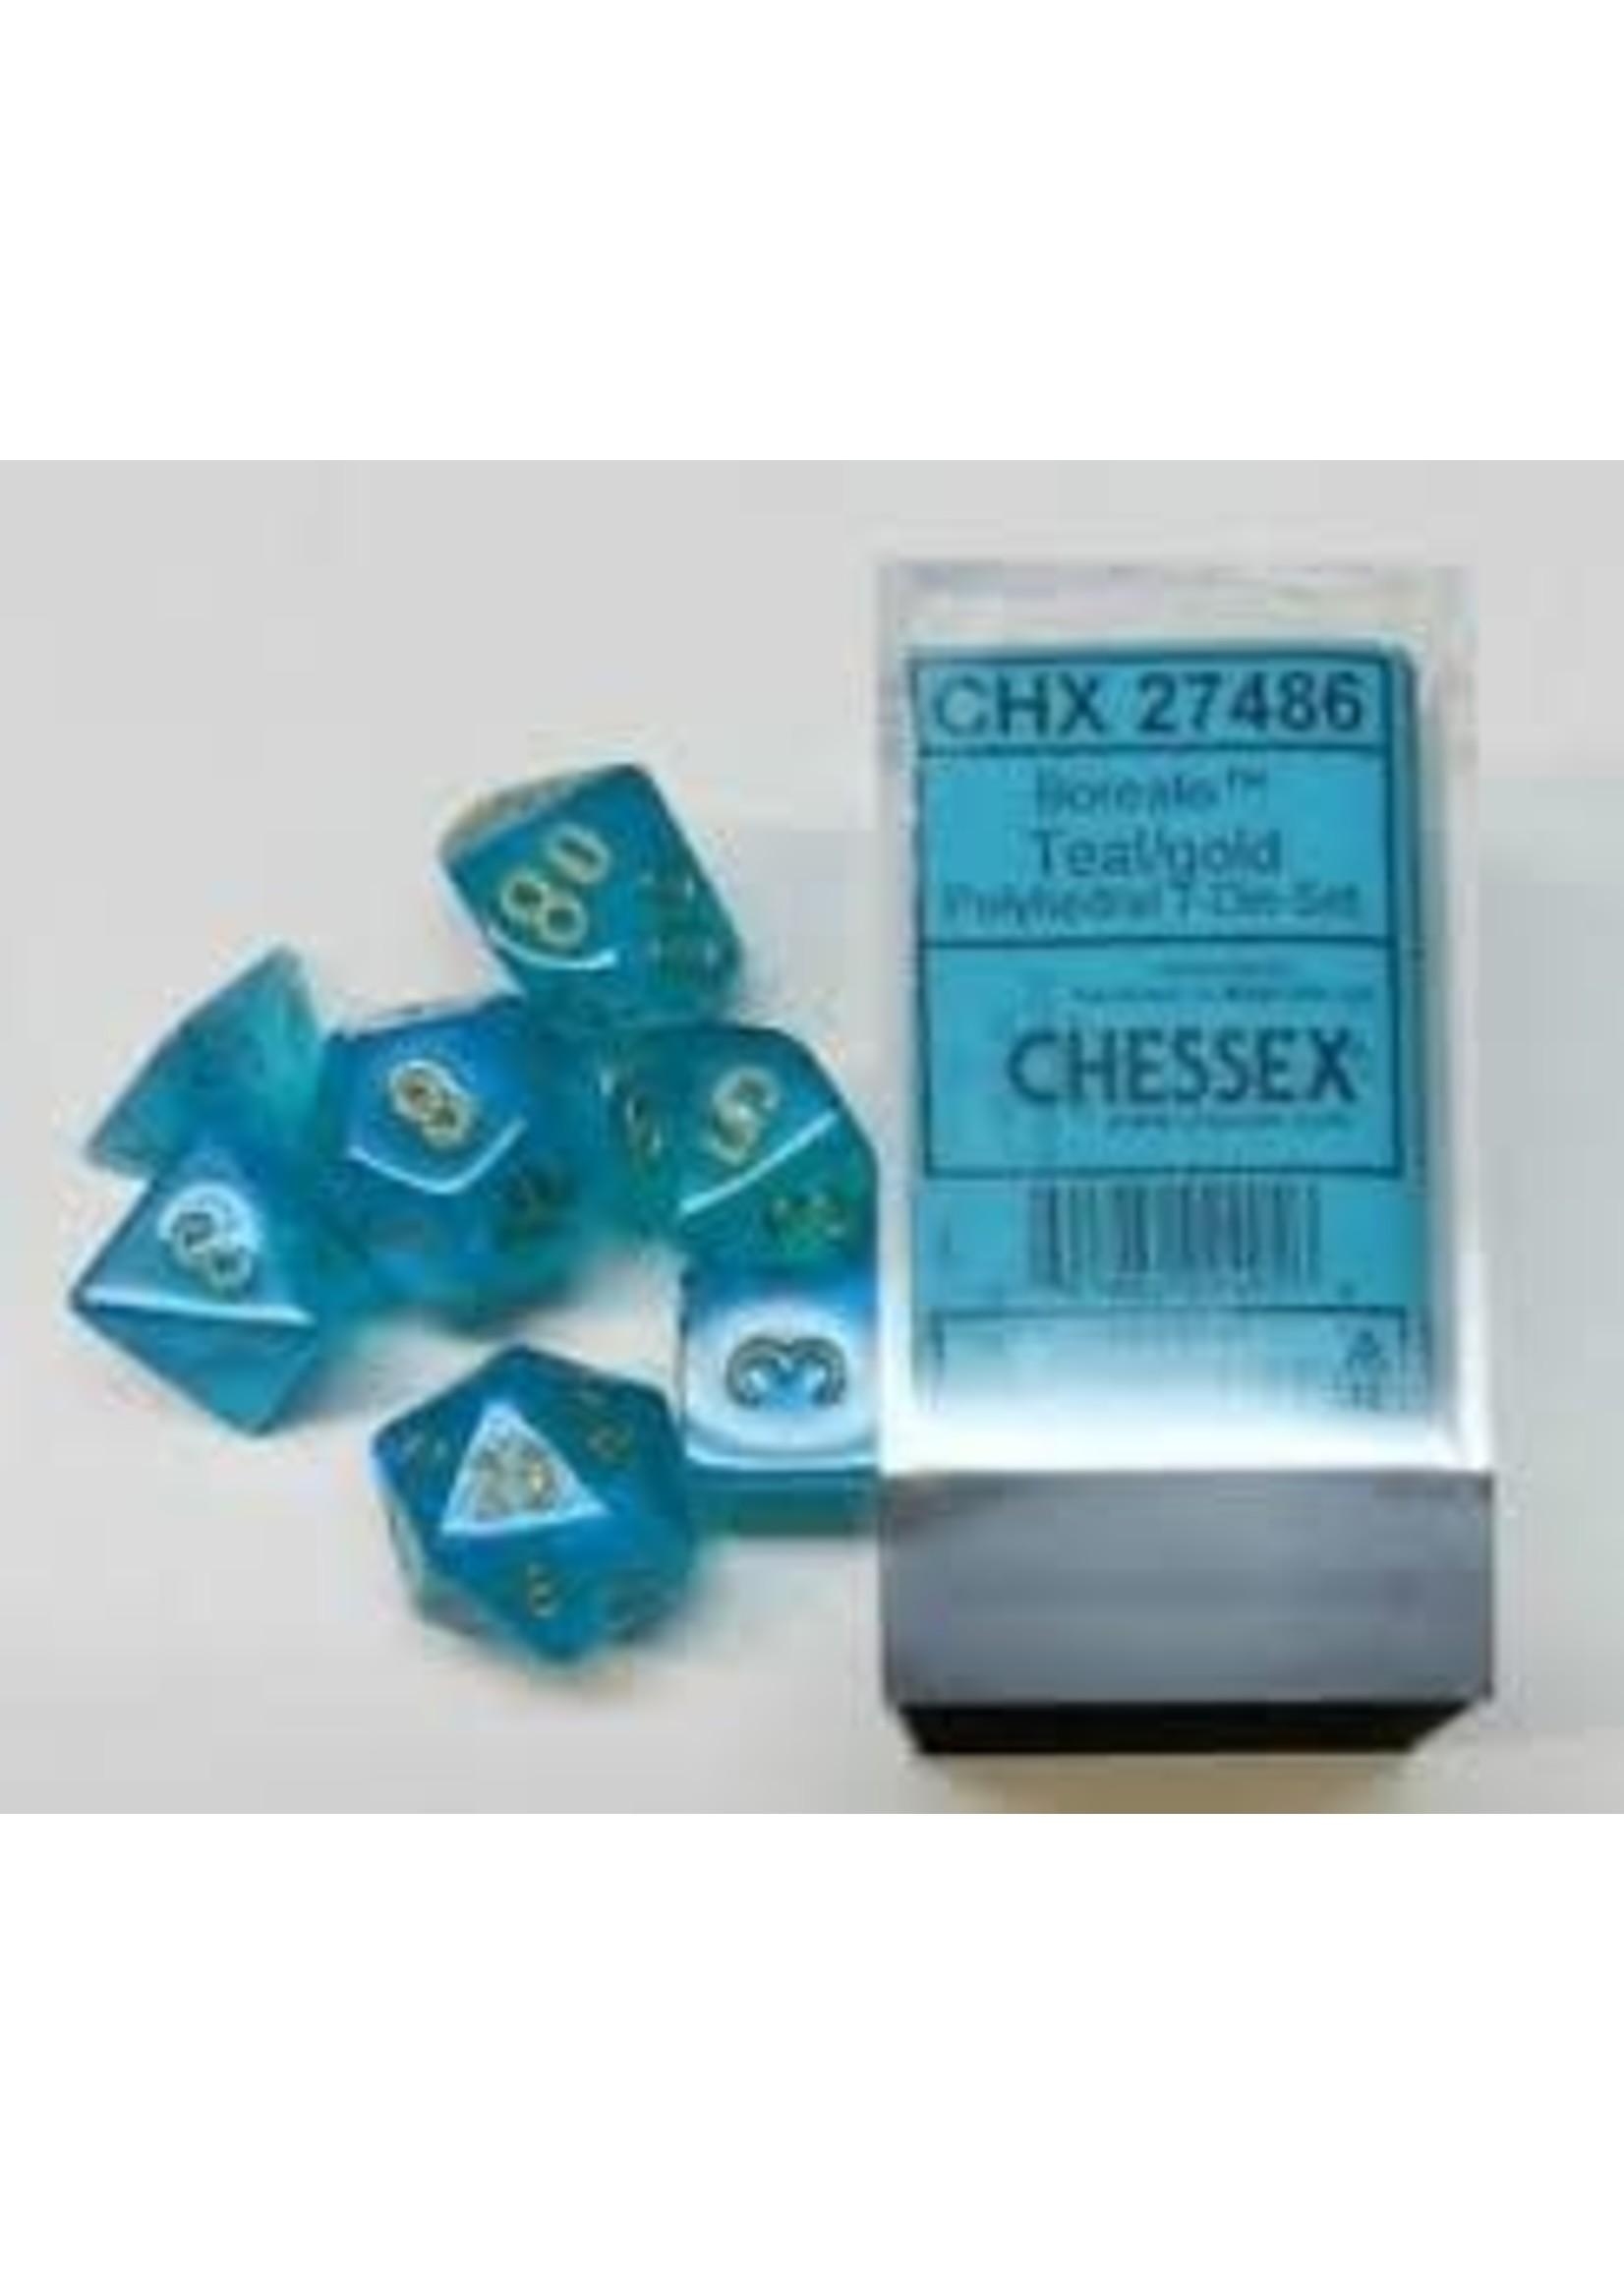 Chessex Borealis Poly 7 set: Teal w/ Gold